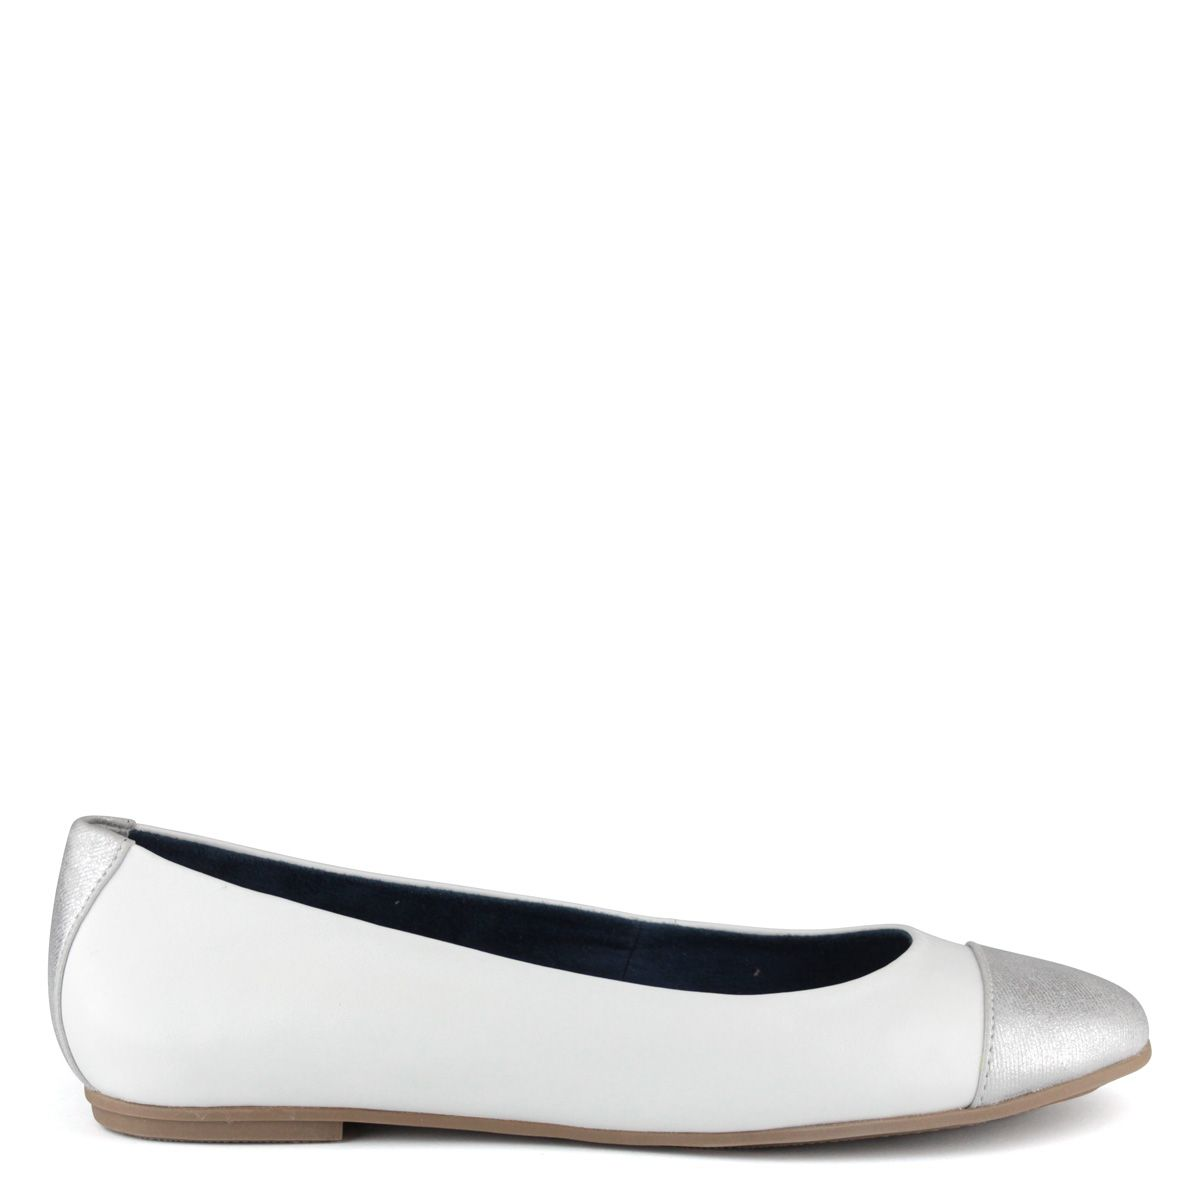 Fehér-ezüst Tamaris balerina cipő  5bd722d9dc